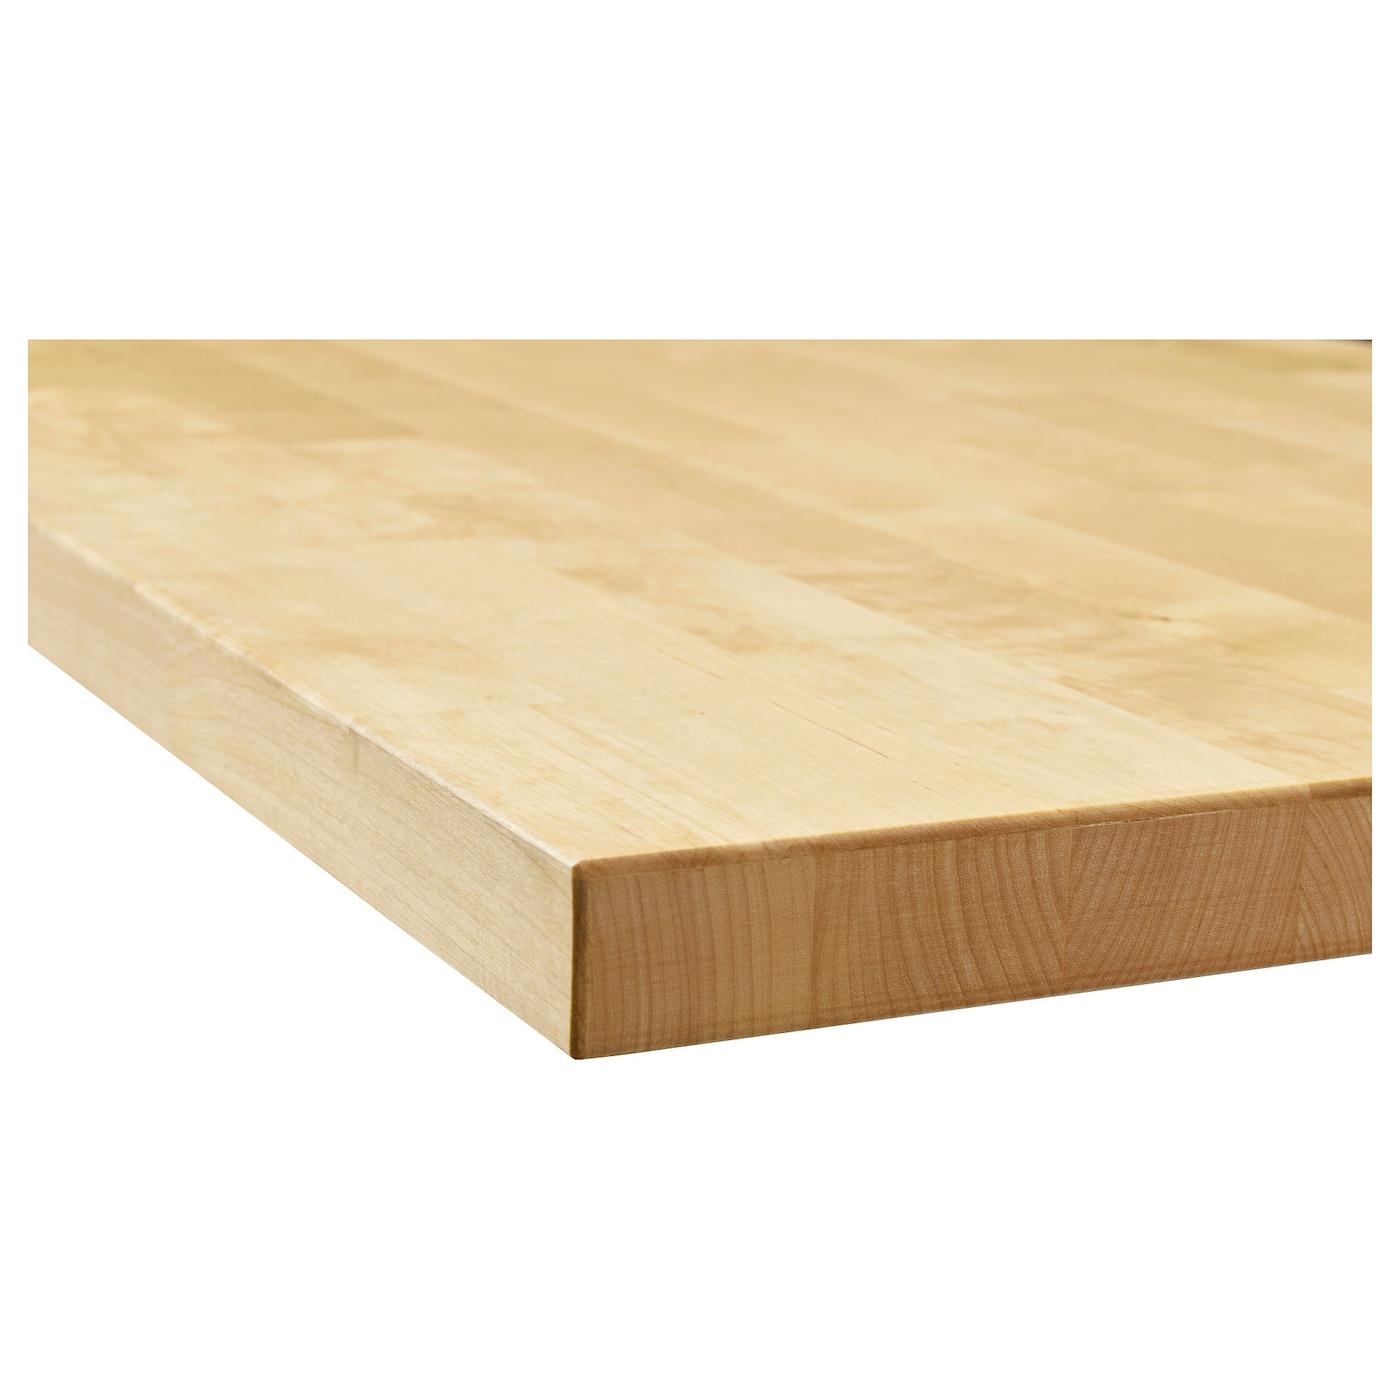 KARLBY Bordplade, birk/finer, 246x3.8 cm